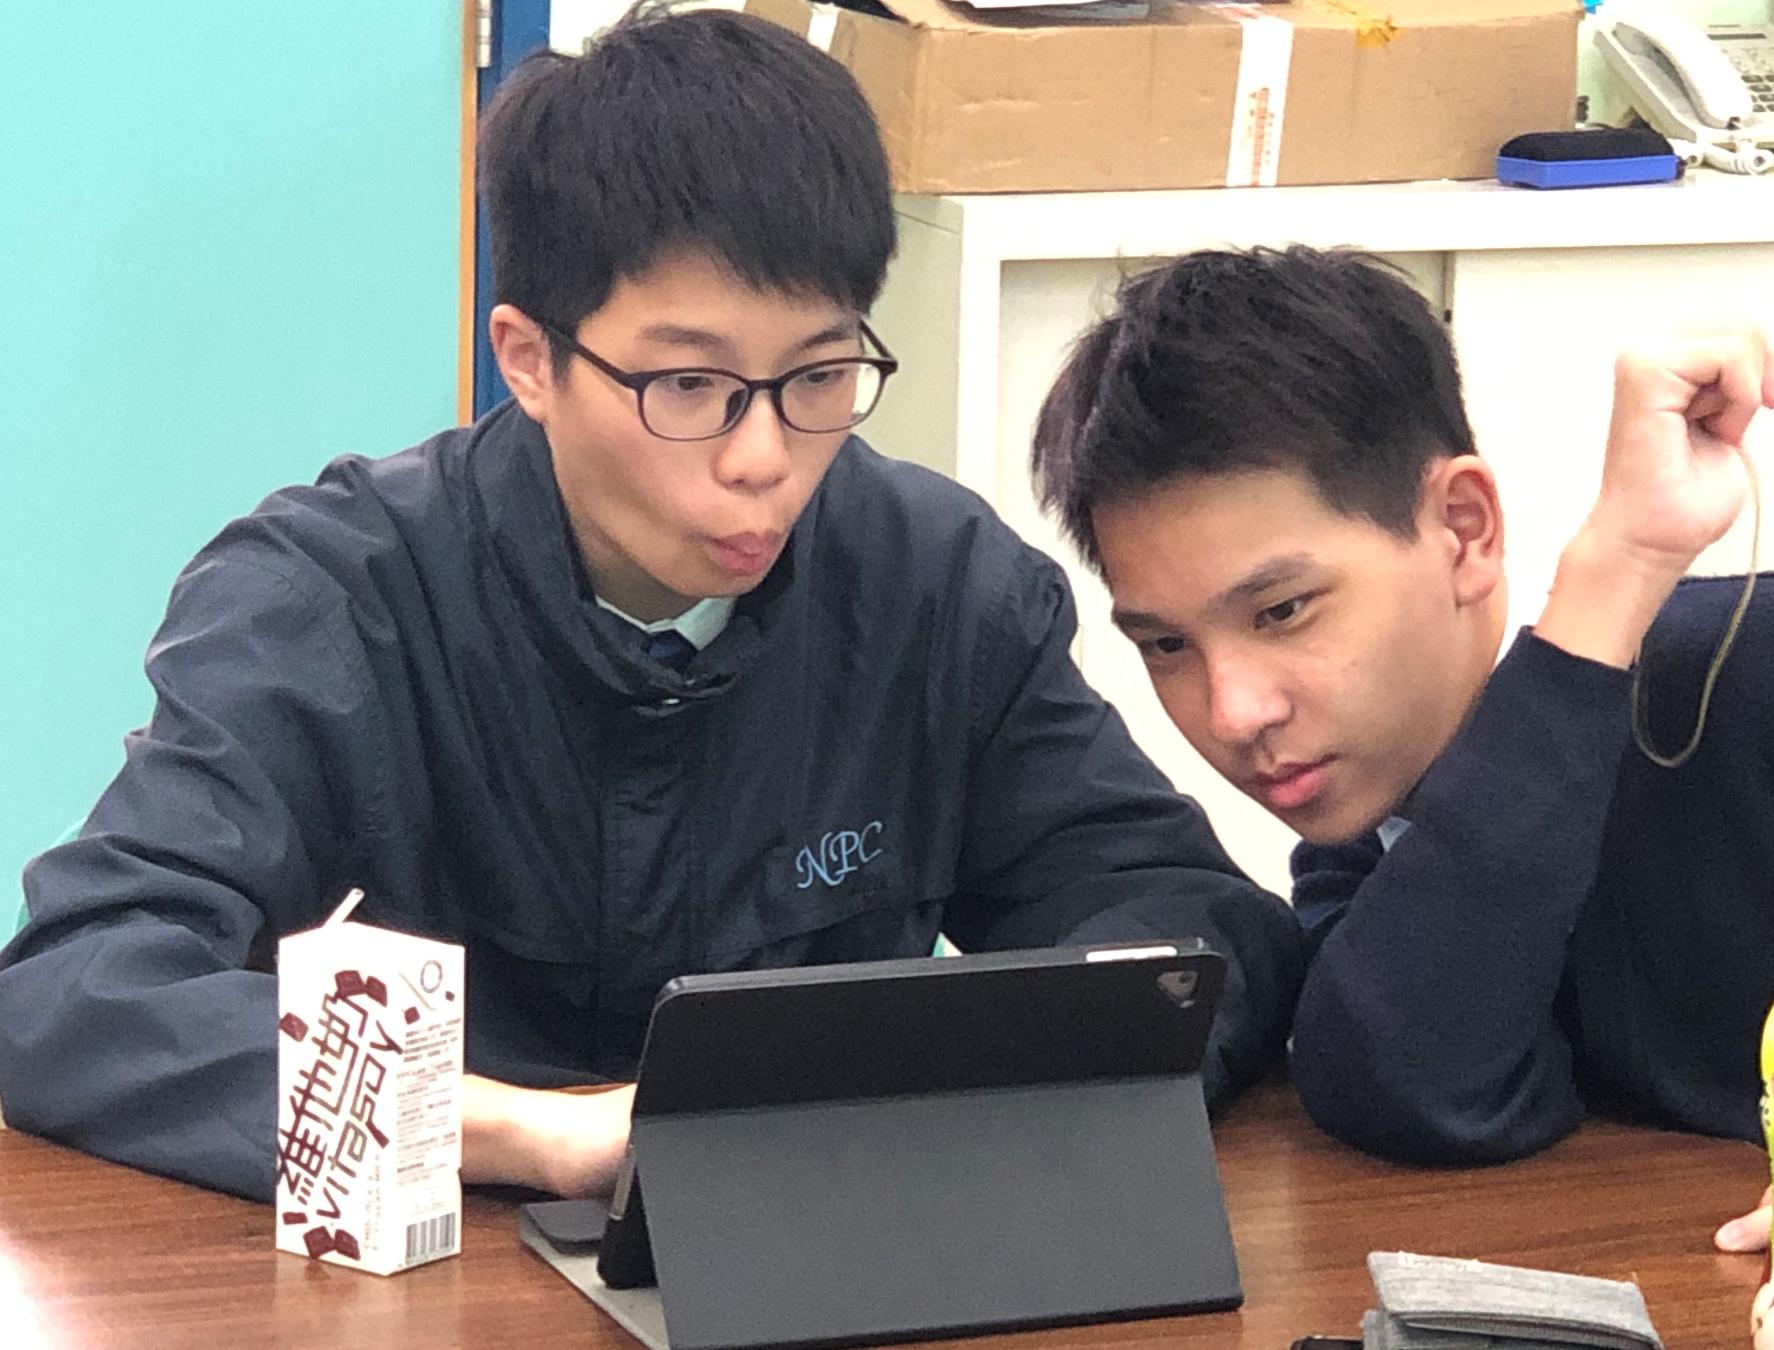 http://npc.edu.hk/sites/default/files/img_3083.jpg